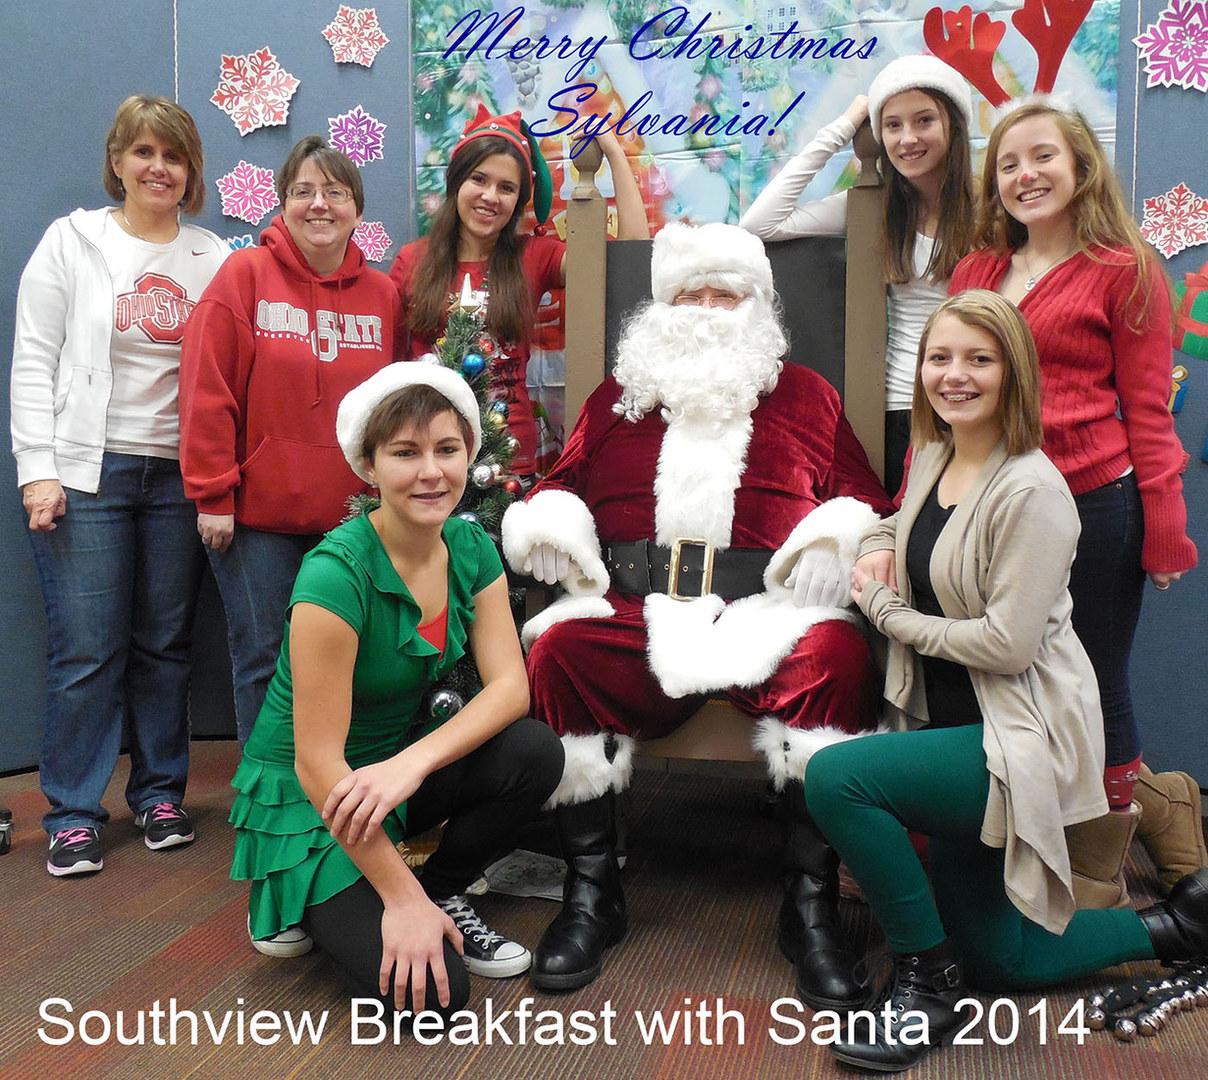 Southview breakfast with Santa.jpg